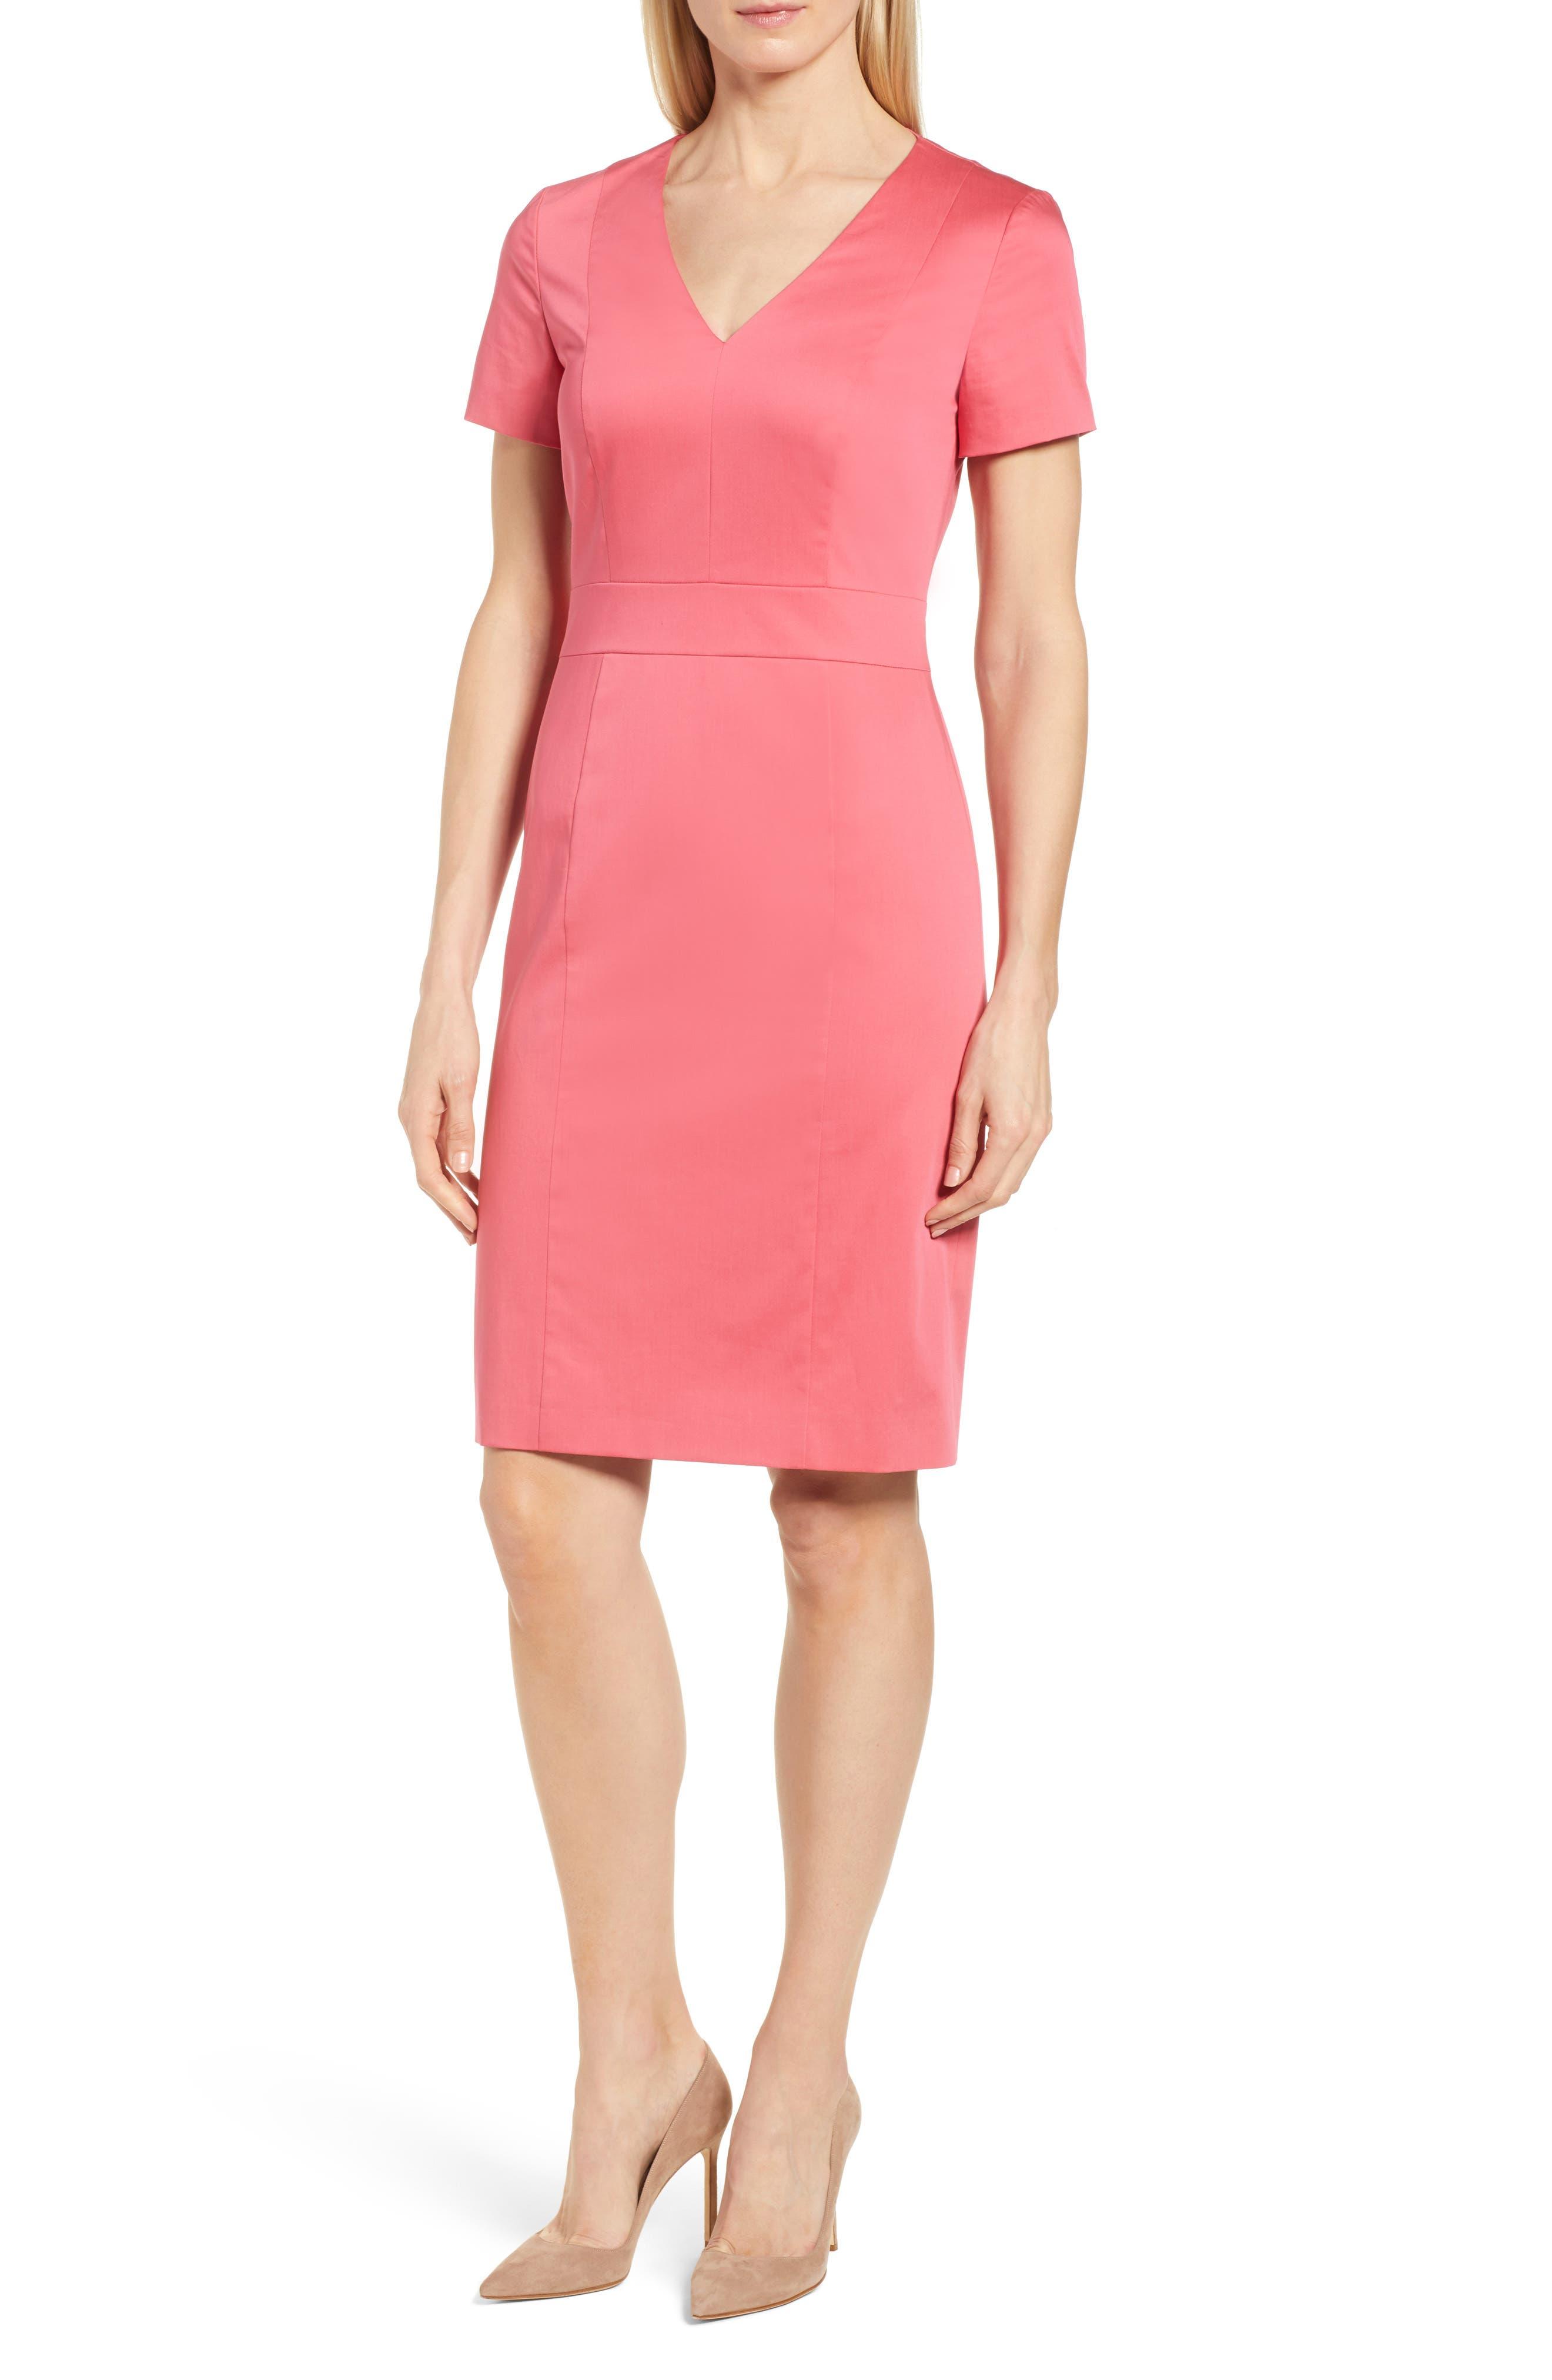 Dasali V-Neck Sheath Dress,                         Main,                         color, Lychee Pink